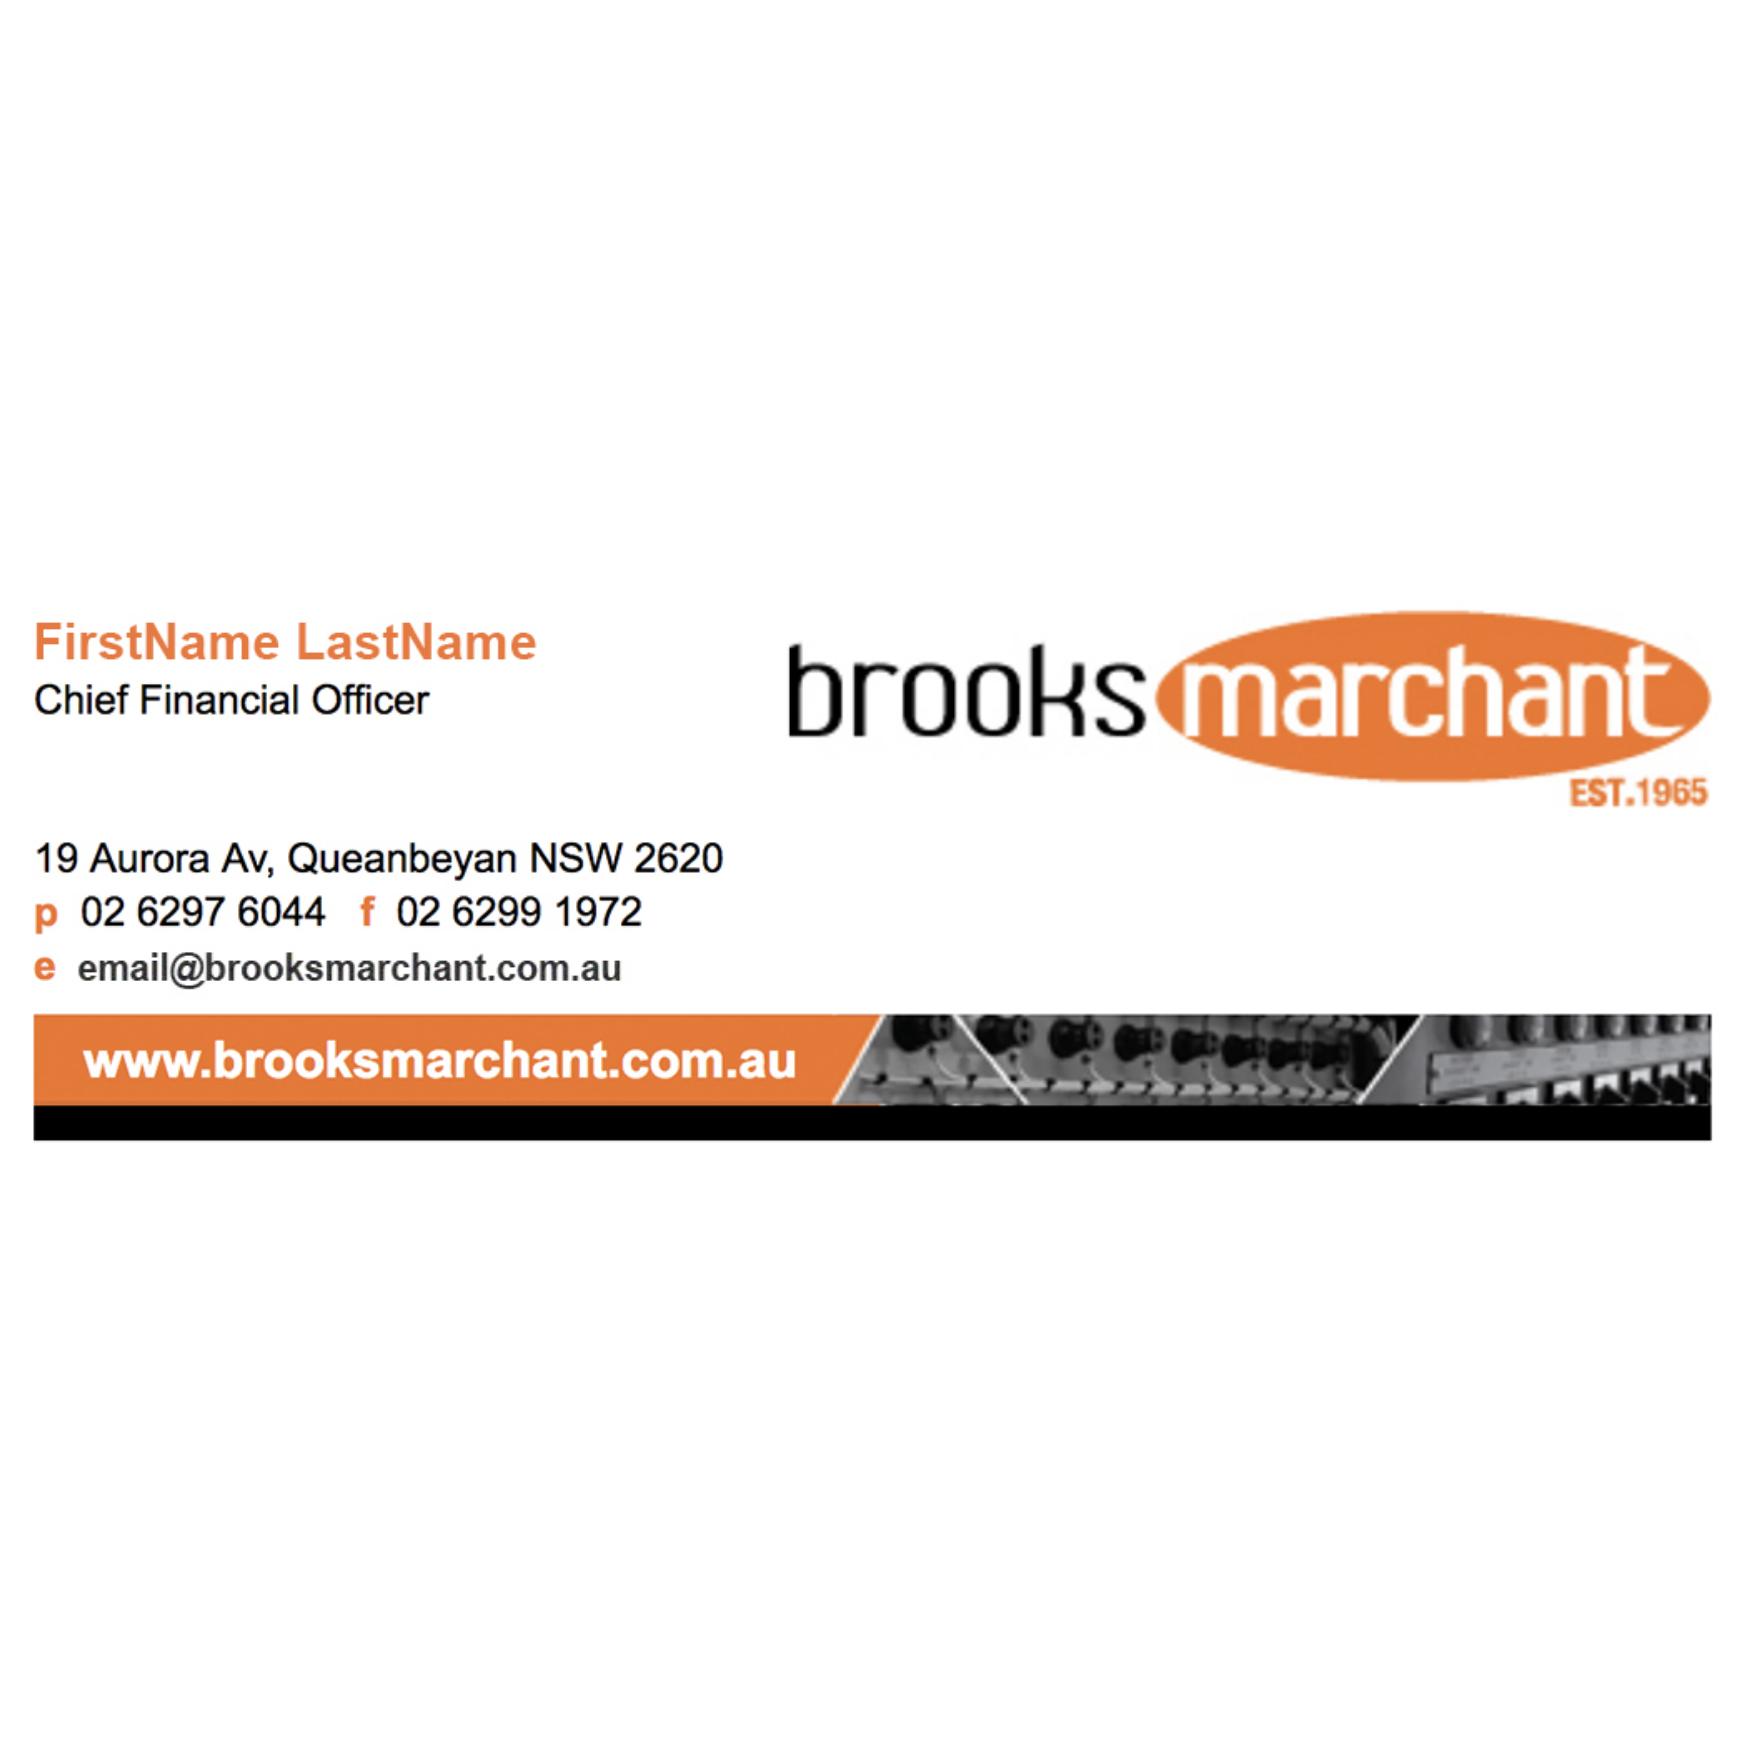 Brooks Marchant E-Signature Design from Fresh Creative